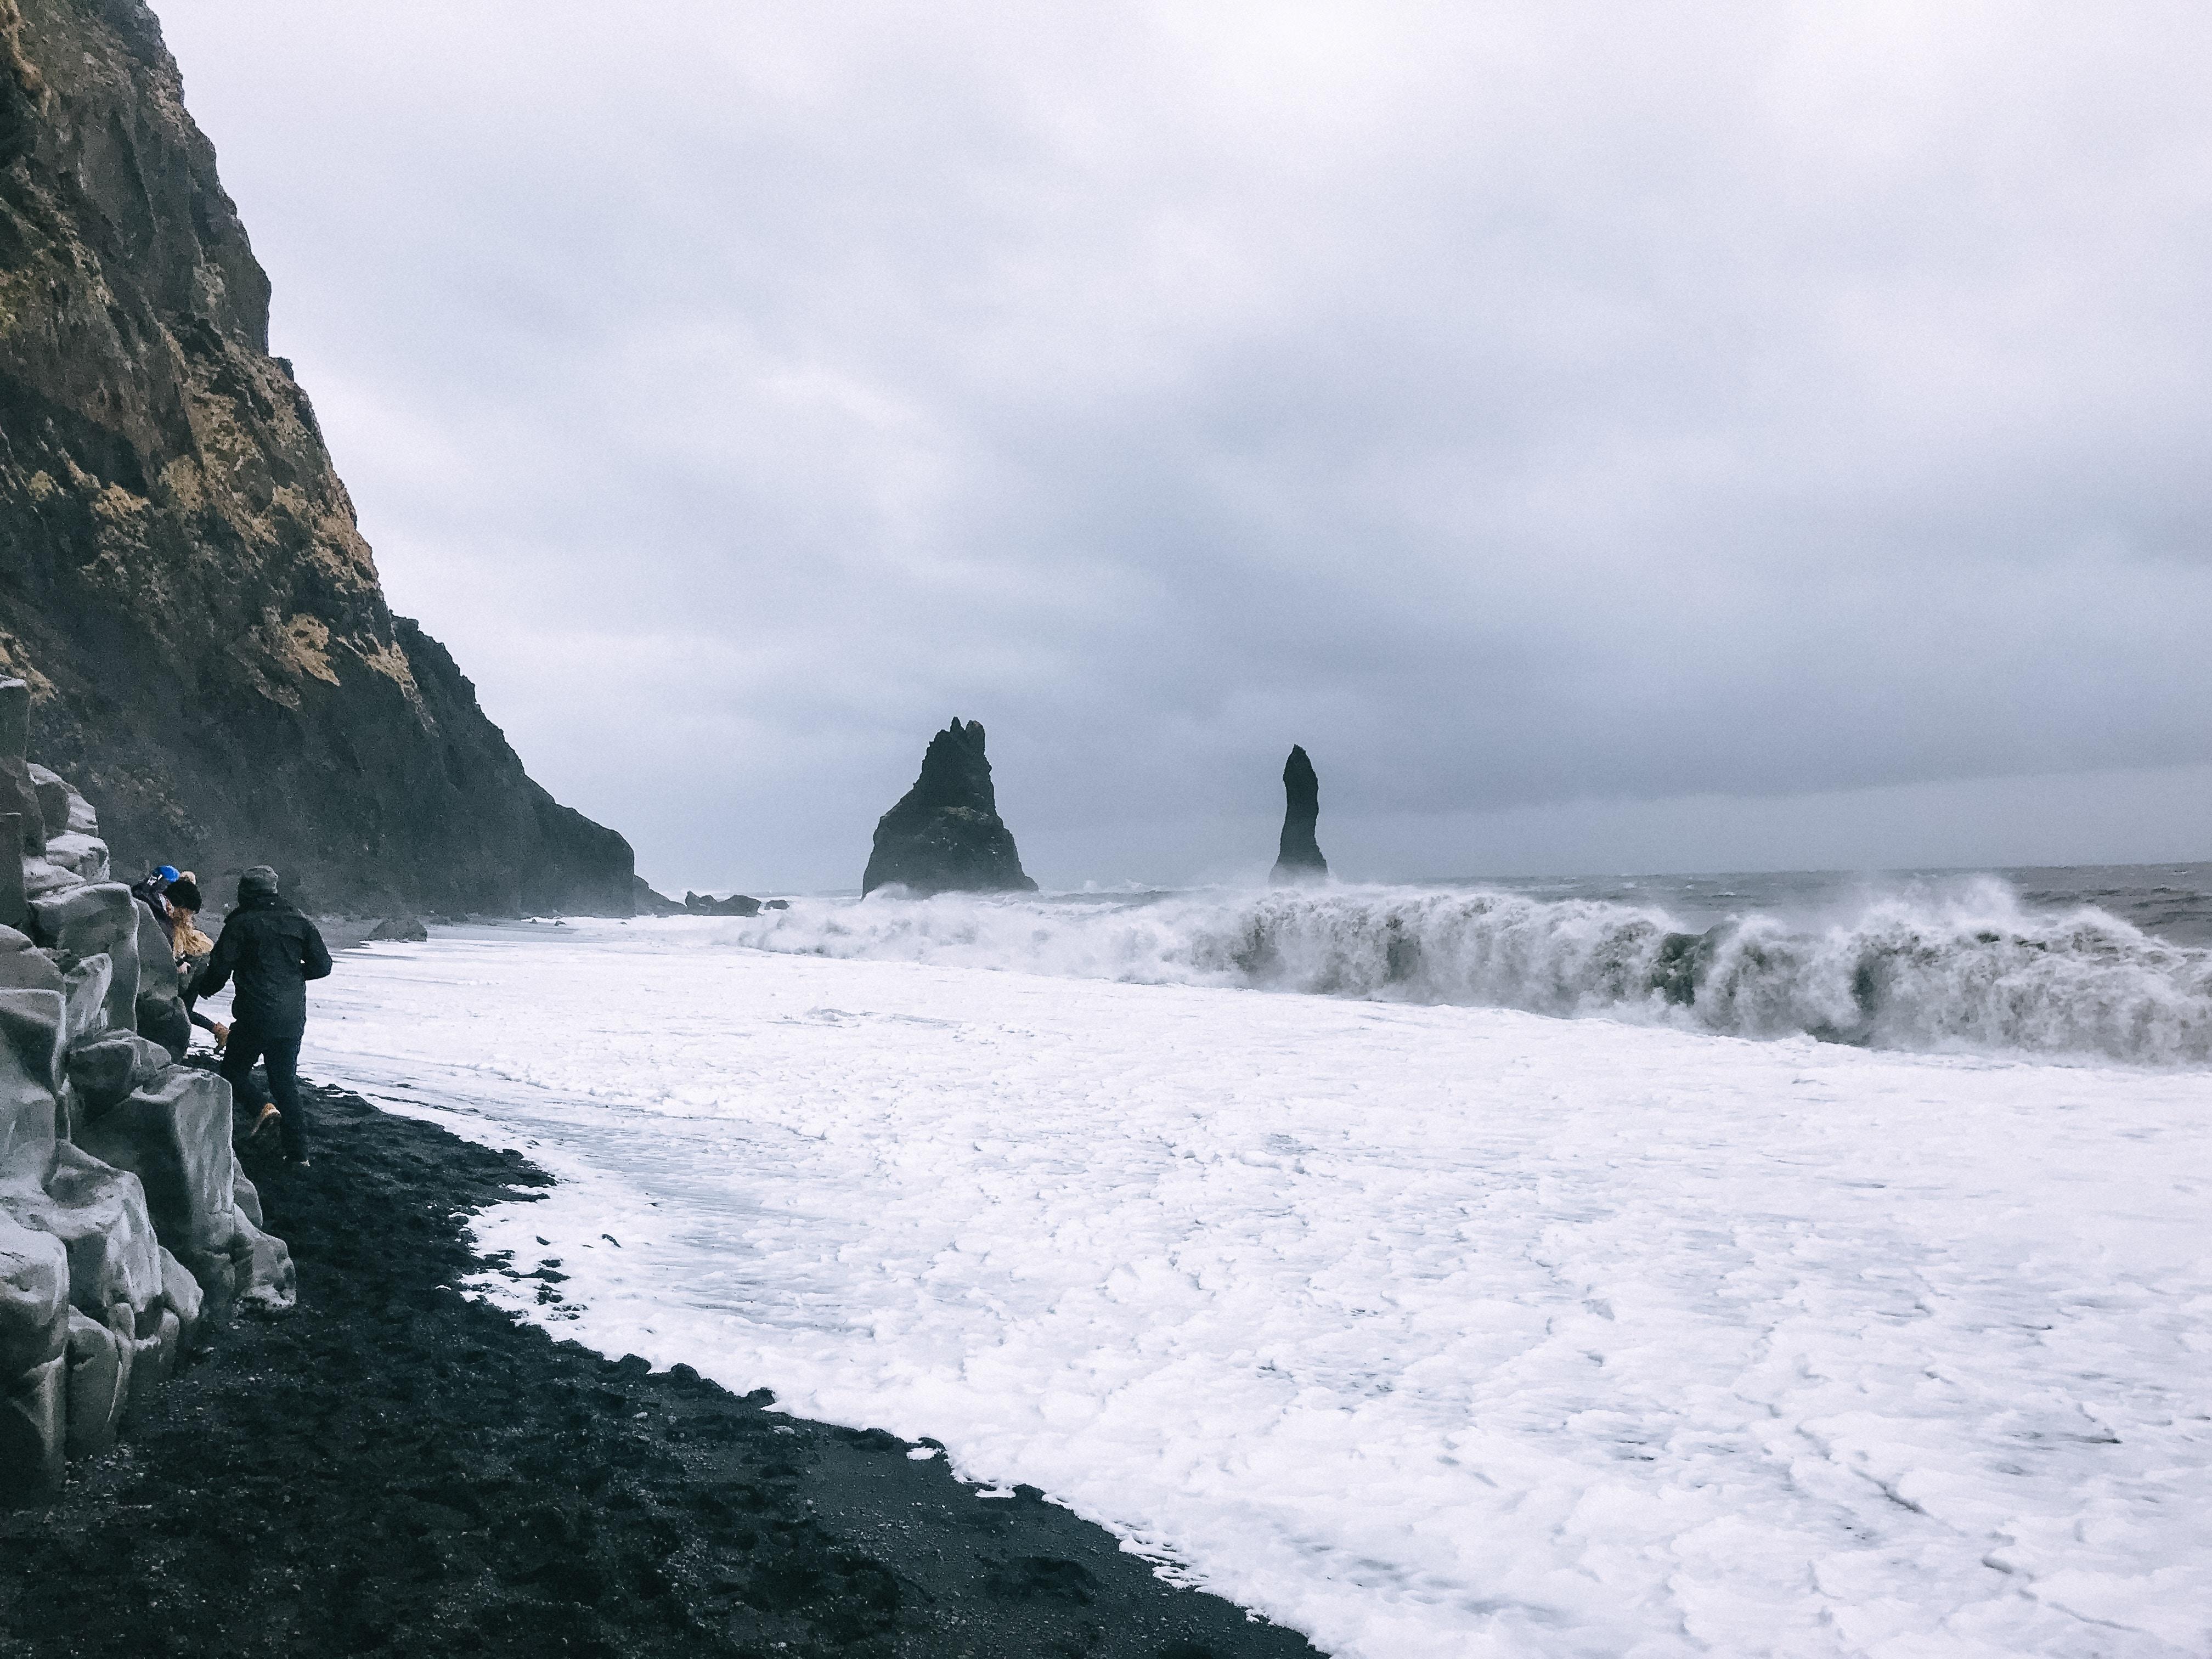 Powerful waves crashing the shores at Reynisfjara black sand beach in Vik, Iceland.